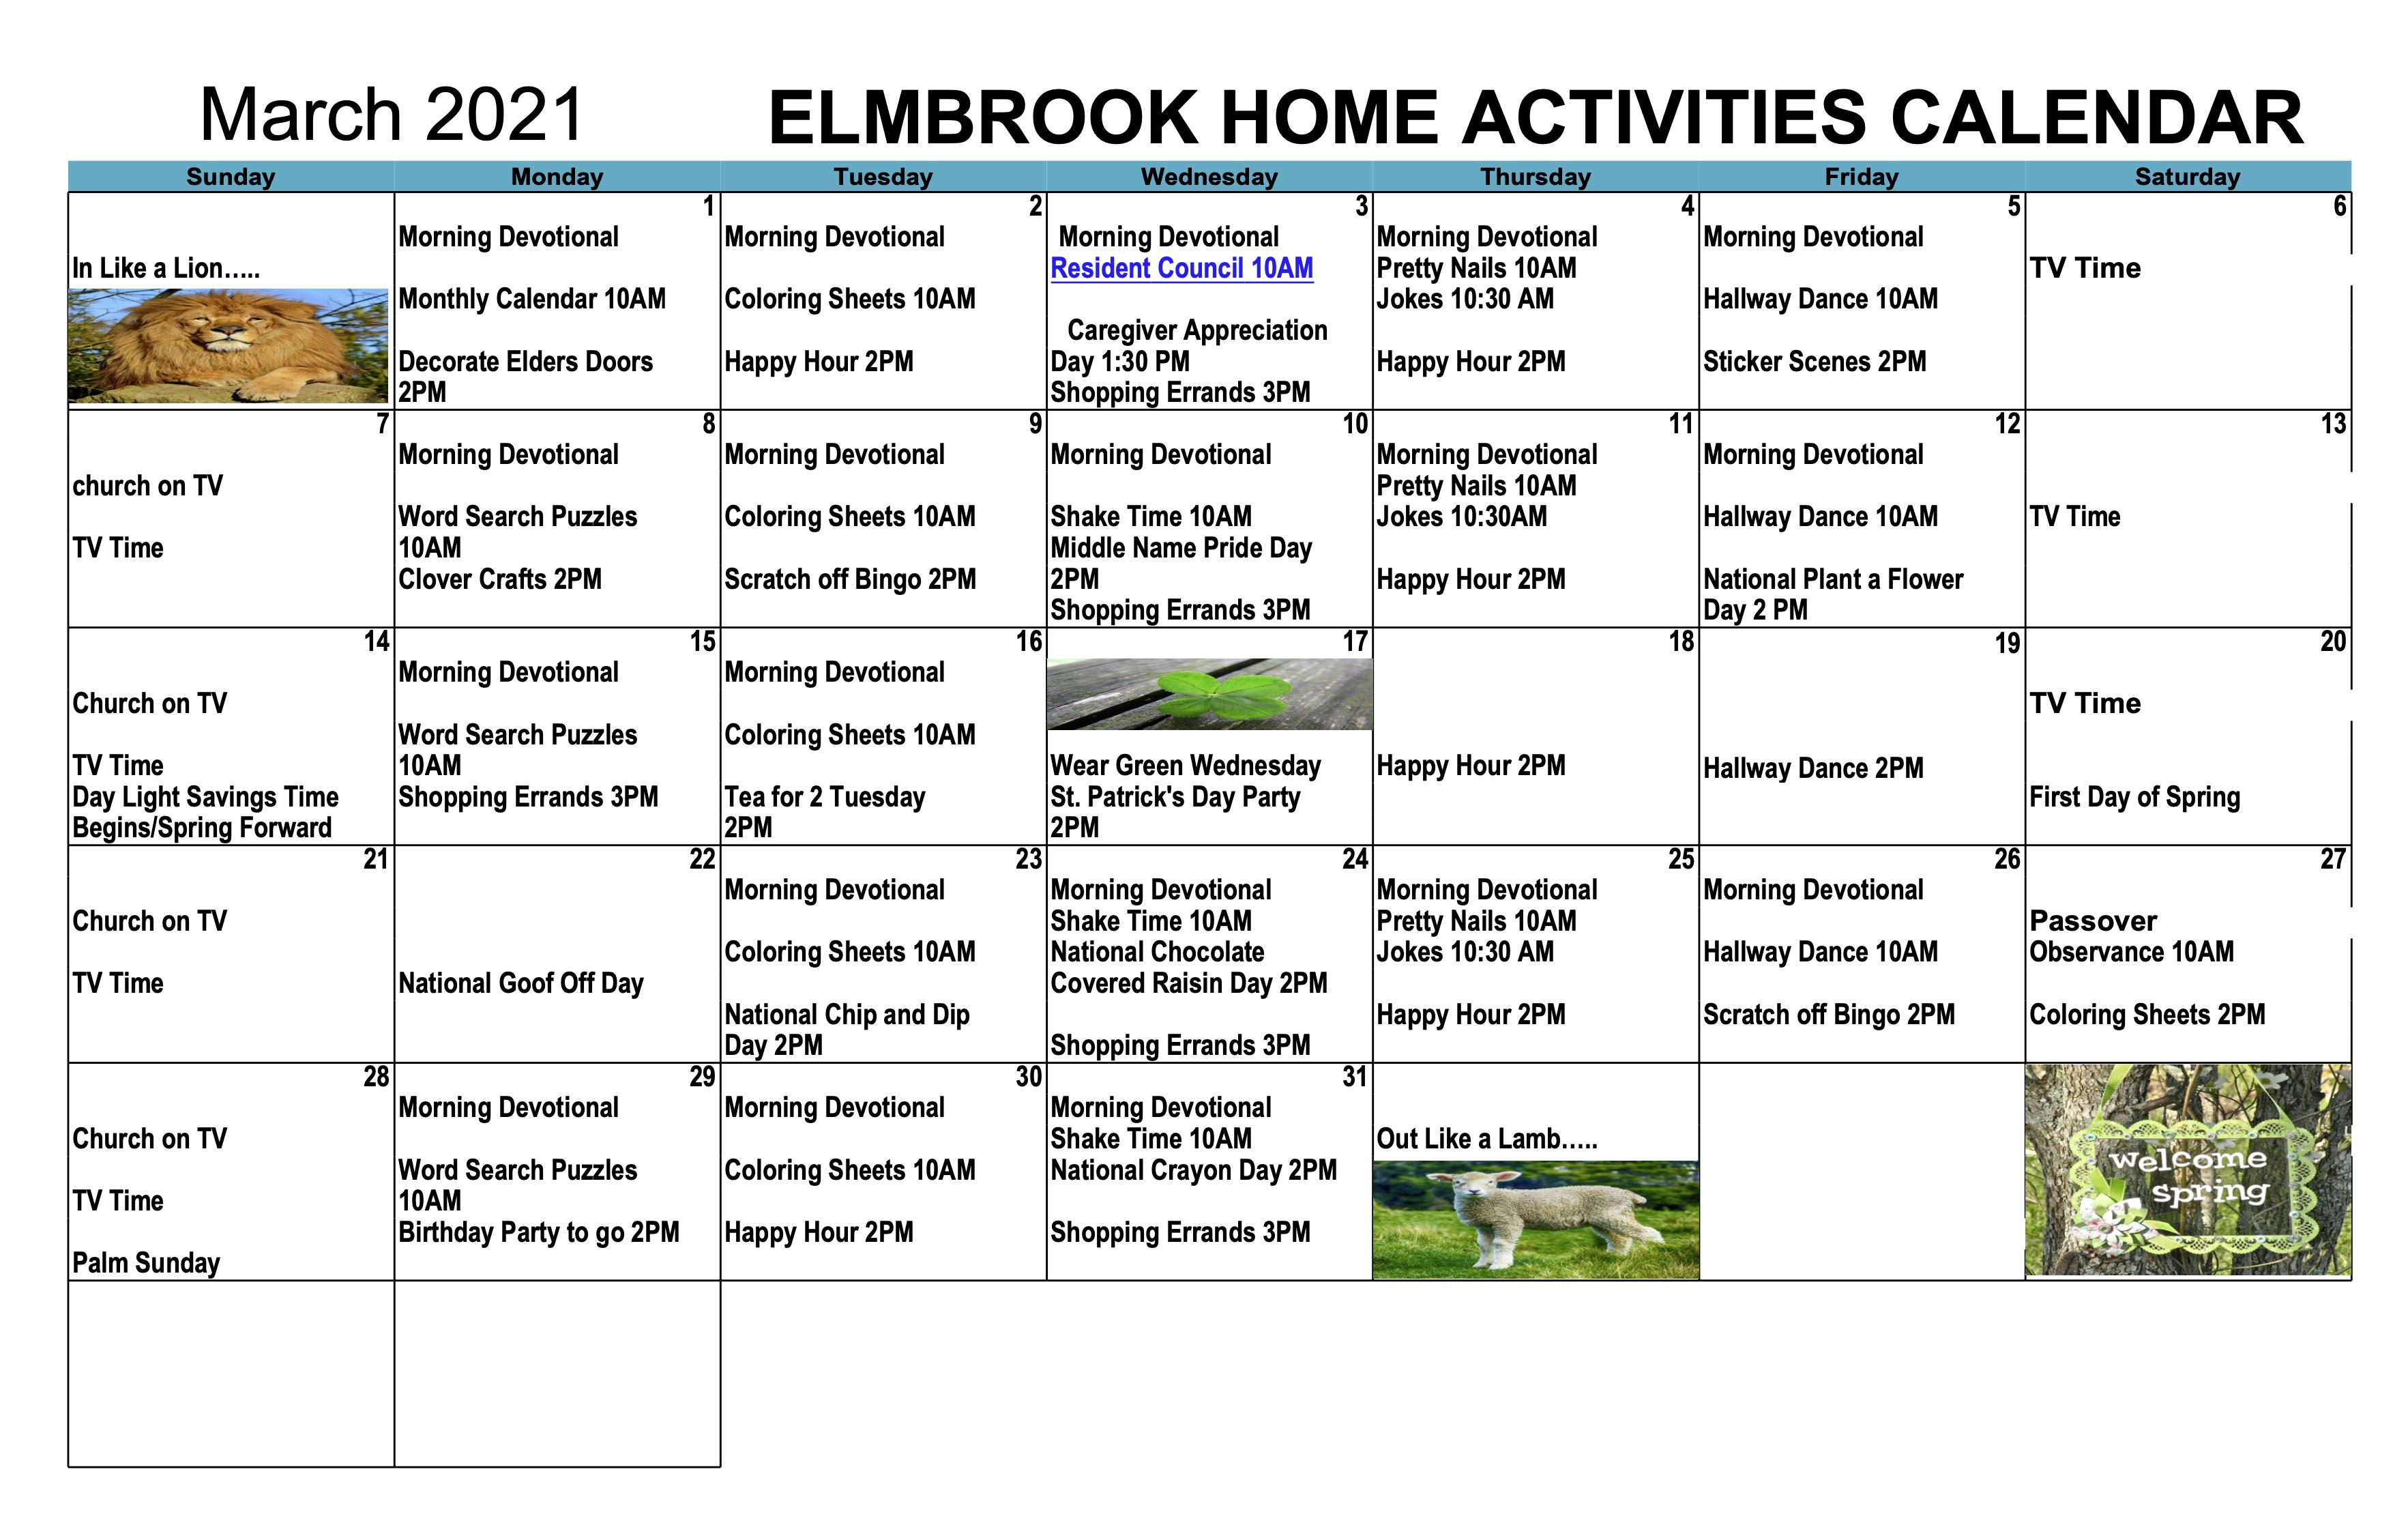 March Elmbrook Home Calendar For 2021